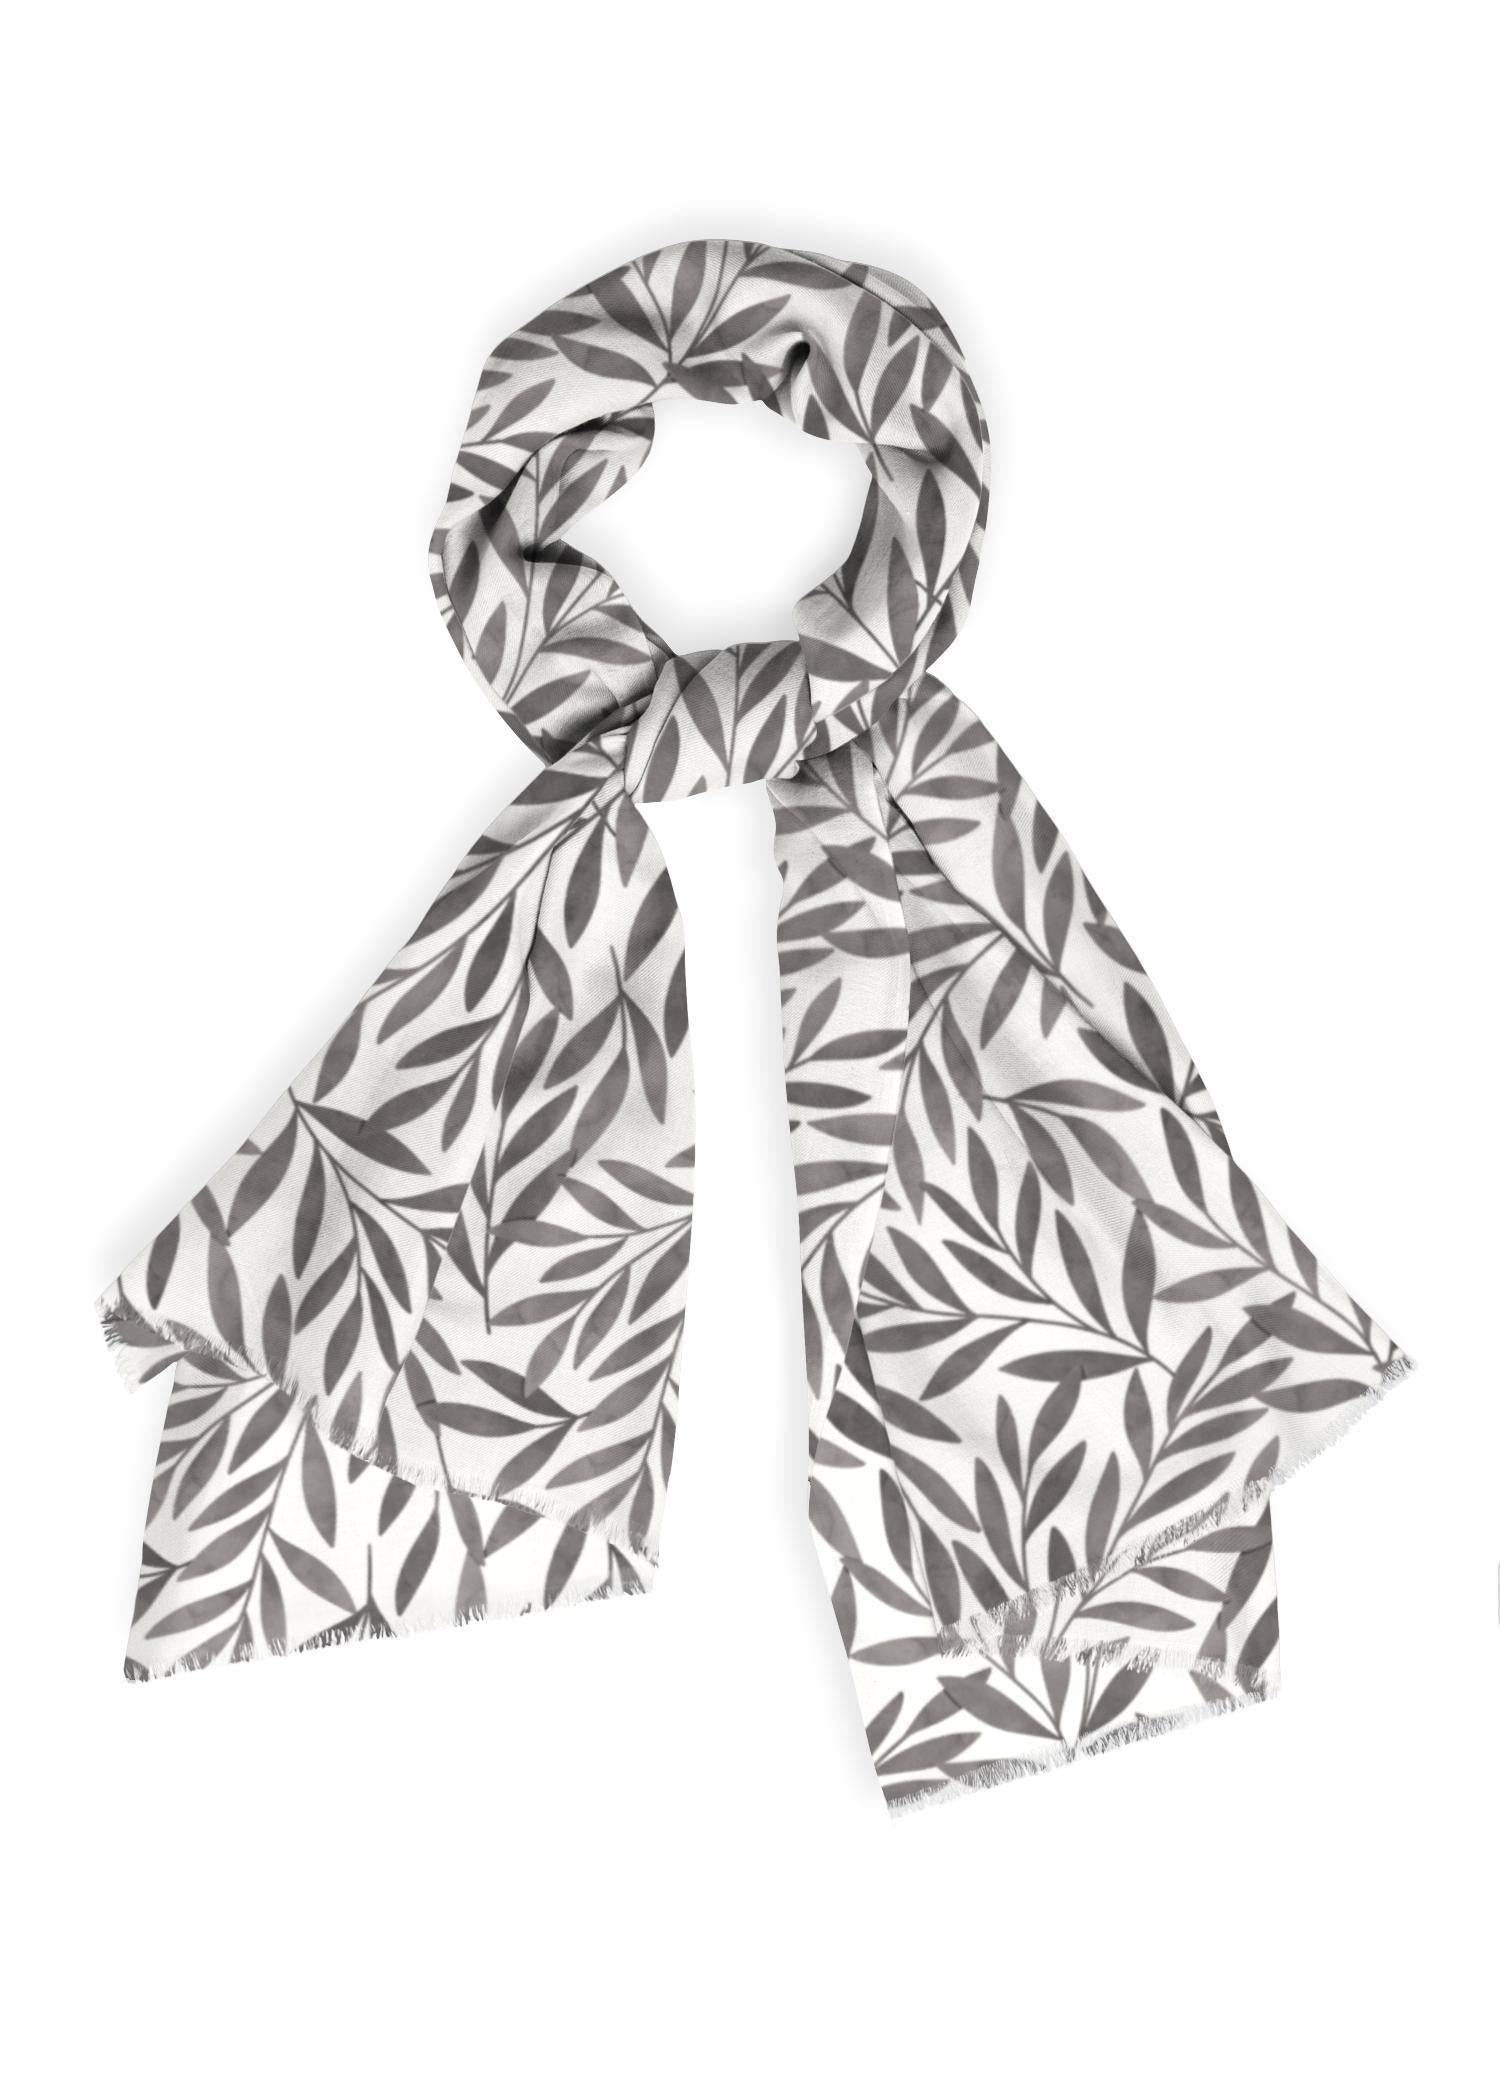 VIDA Cashmere Silk Scarf - Elegant Black Garden by VIDA Original Artist  - Size: One Size